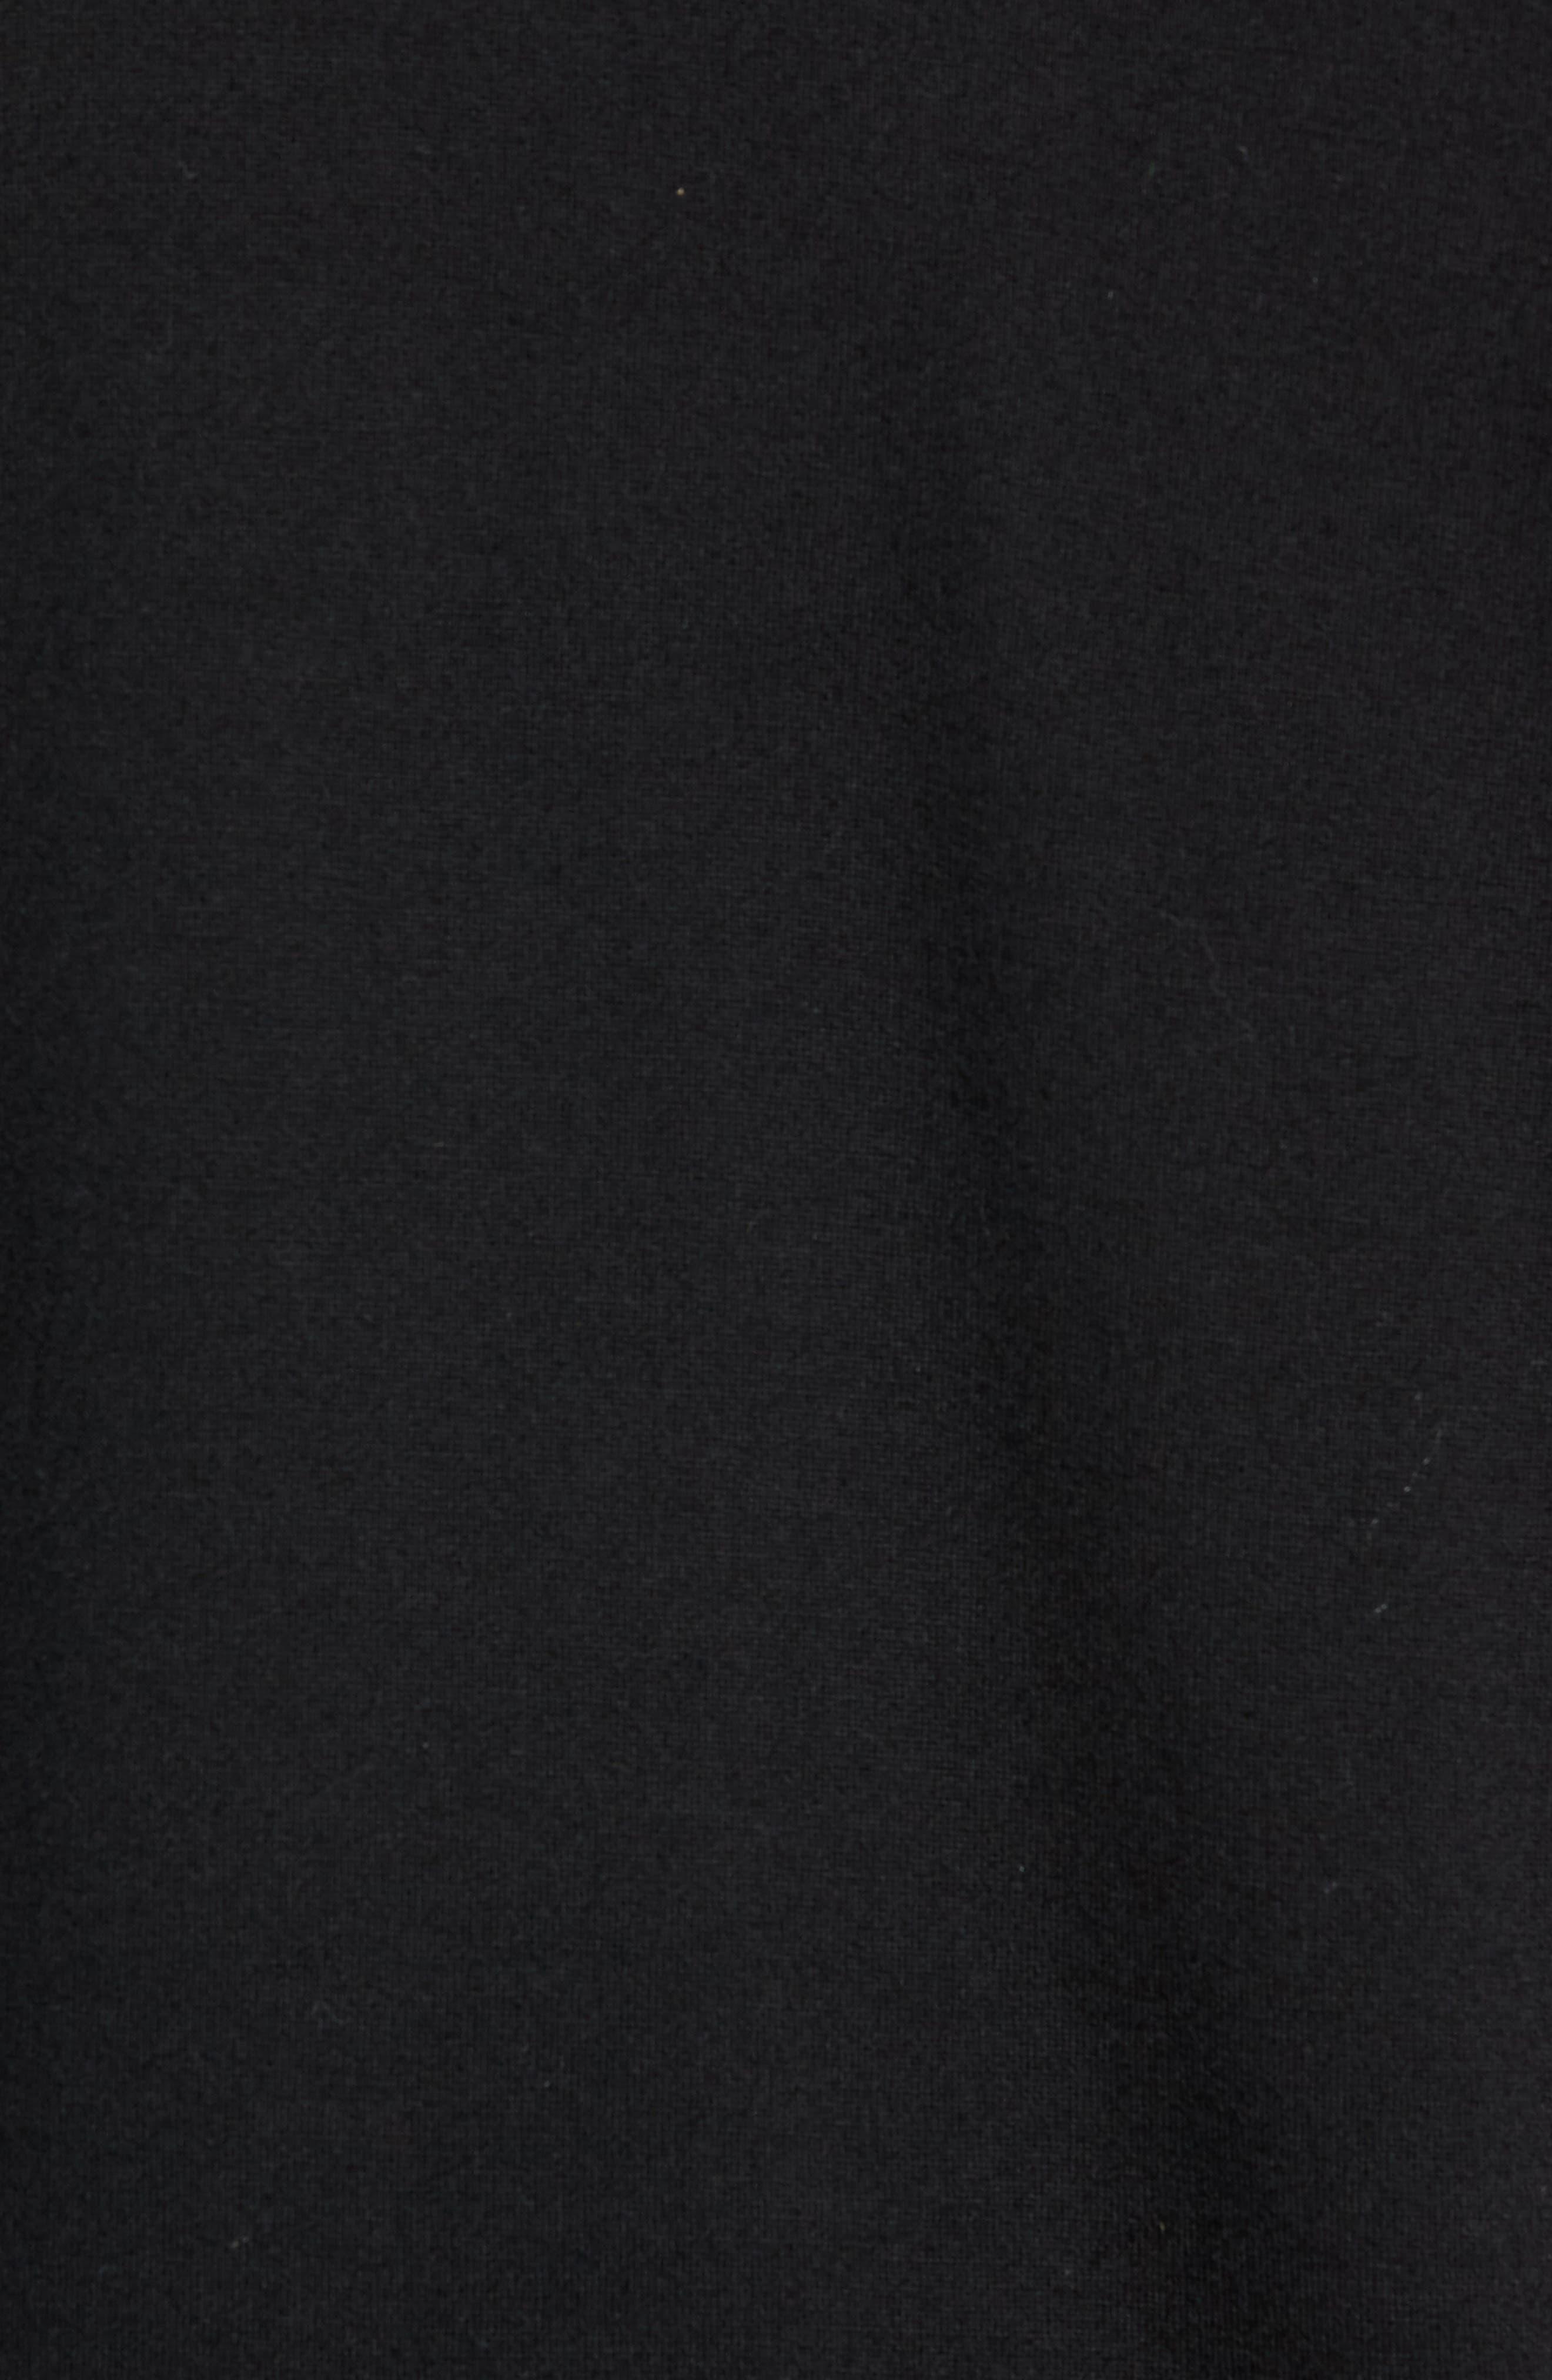 Swedish Merino Wool Trail Shirt,                             Alternate thumbnail 5, color,                             BLACK